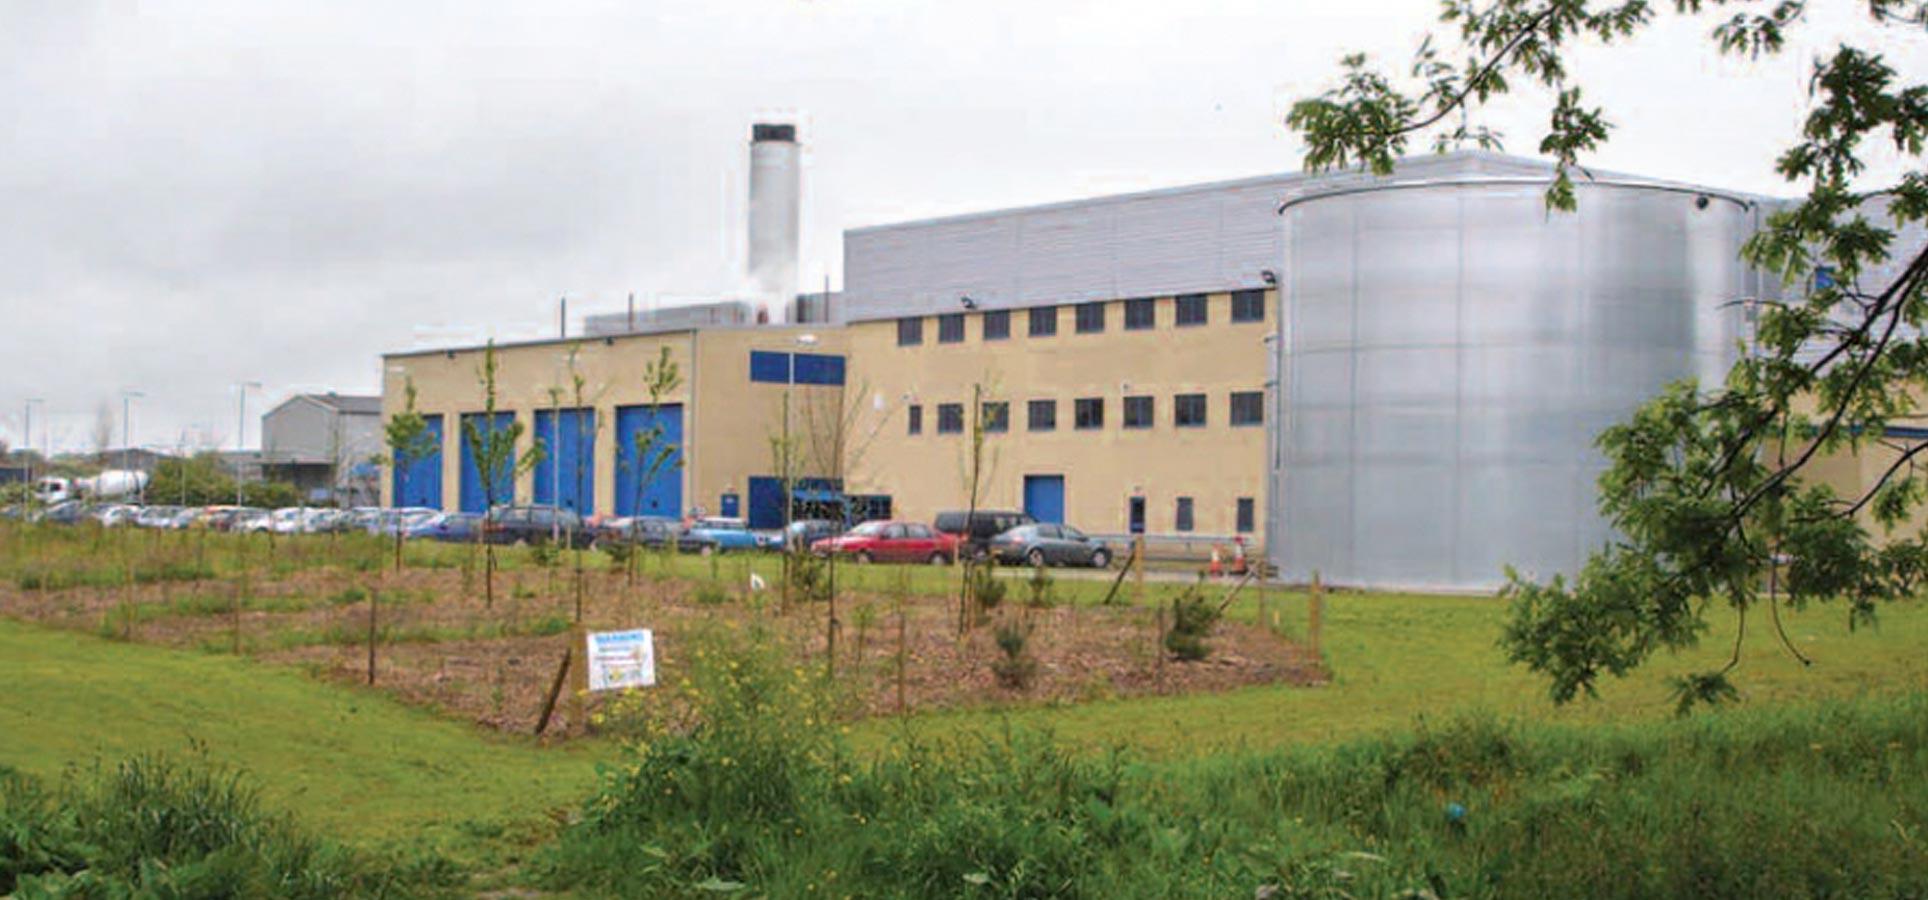 FOOD PRODUCTION FACILITY, Jessops Construction Ltd